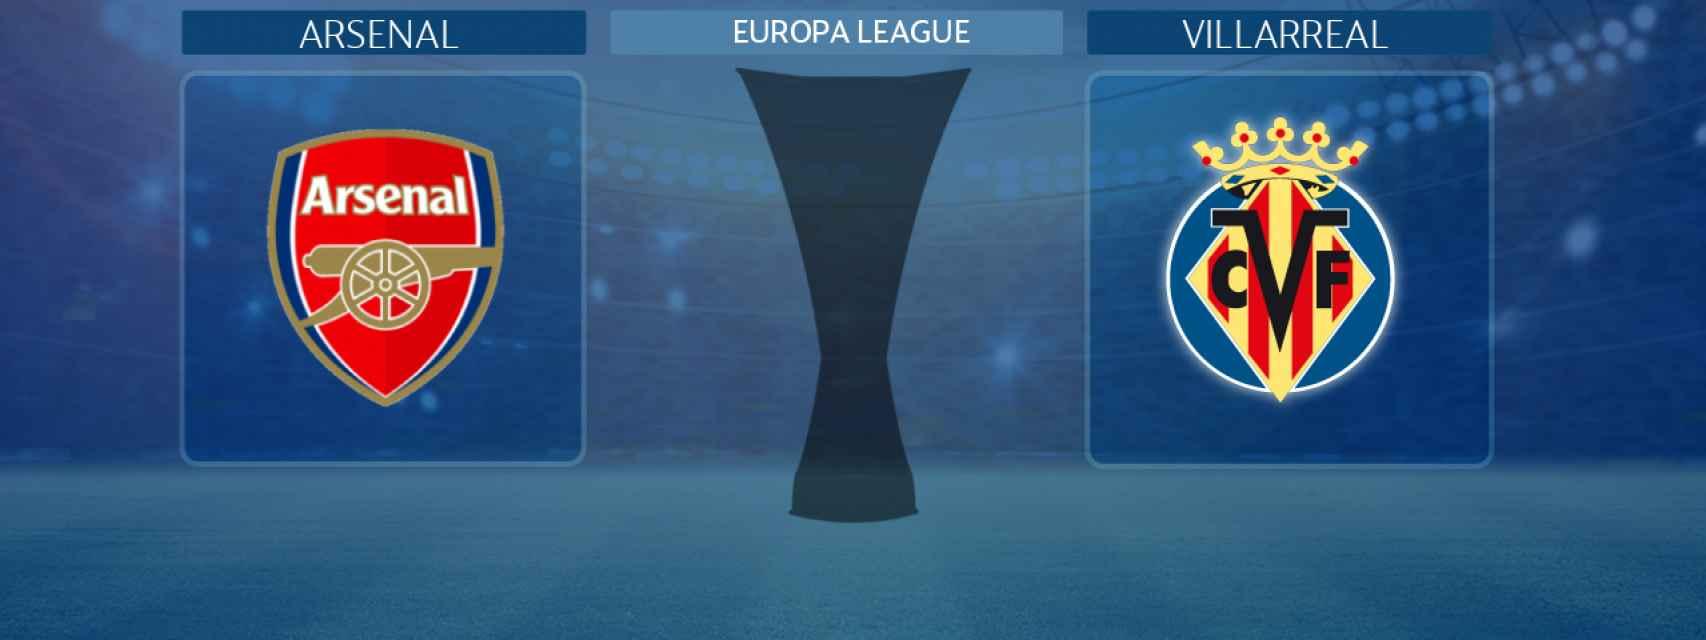 Arsenal - Villarreal, partido de la Europa League